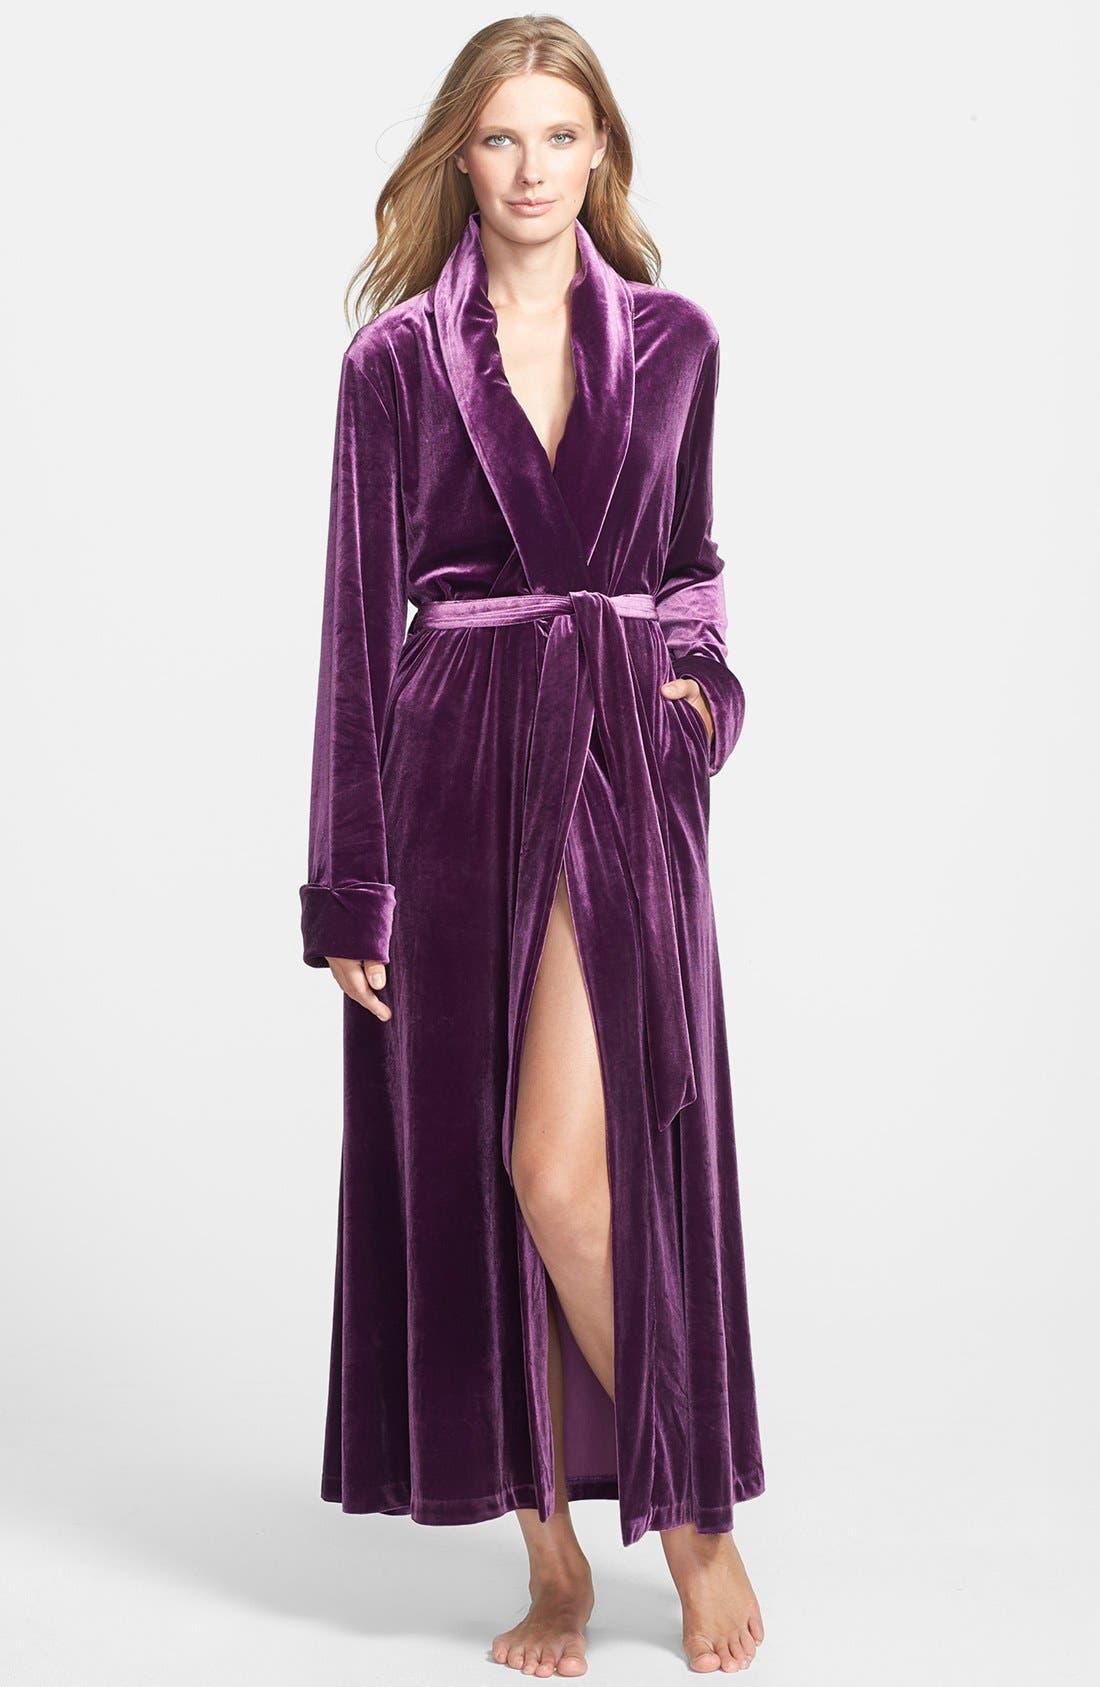 Alternate Image 1 Selected - Oscar de la Renta Sleepwear 'Zahara Nights' Velvet Robe